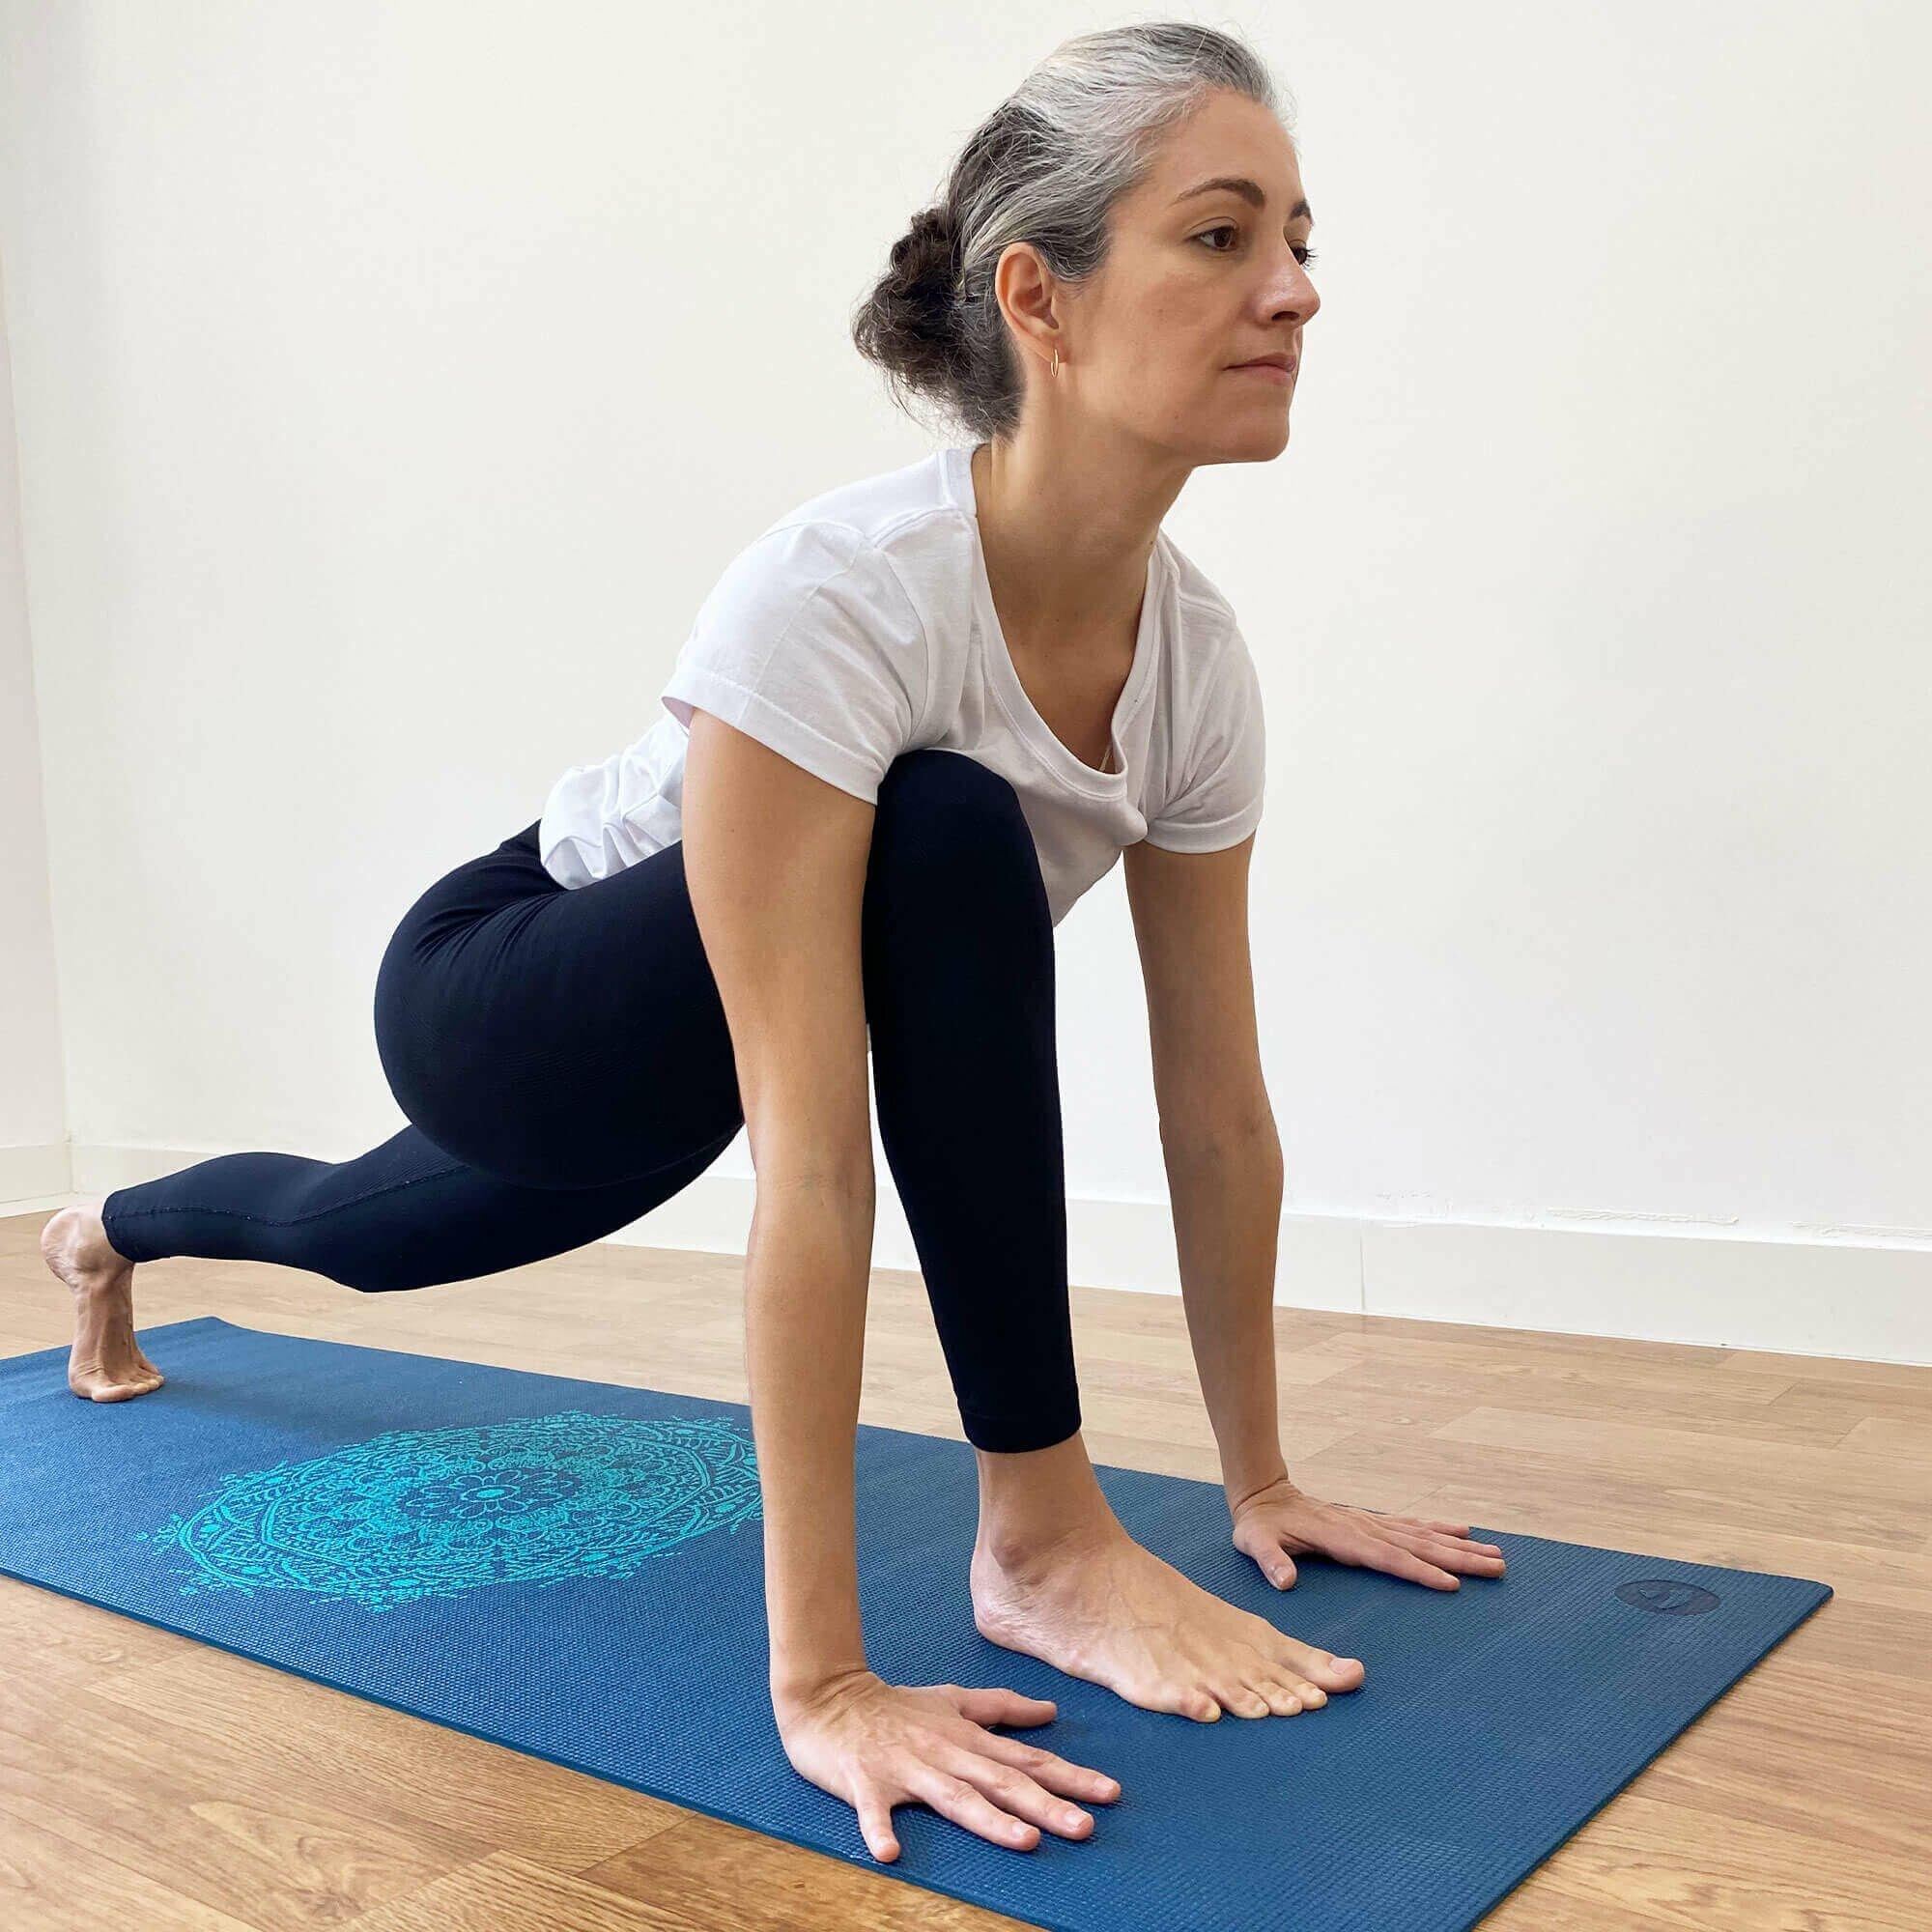 tapete-yoga-leela-mandala-yogateria-petroleo-turquesa-12